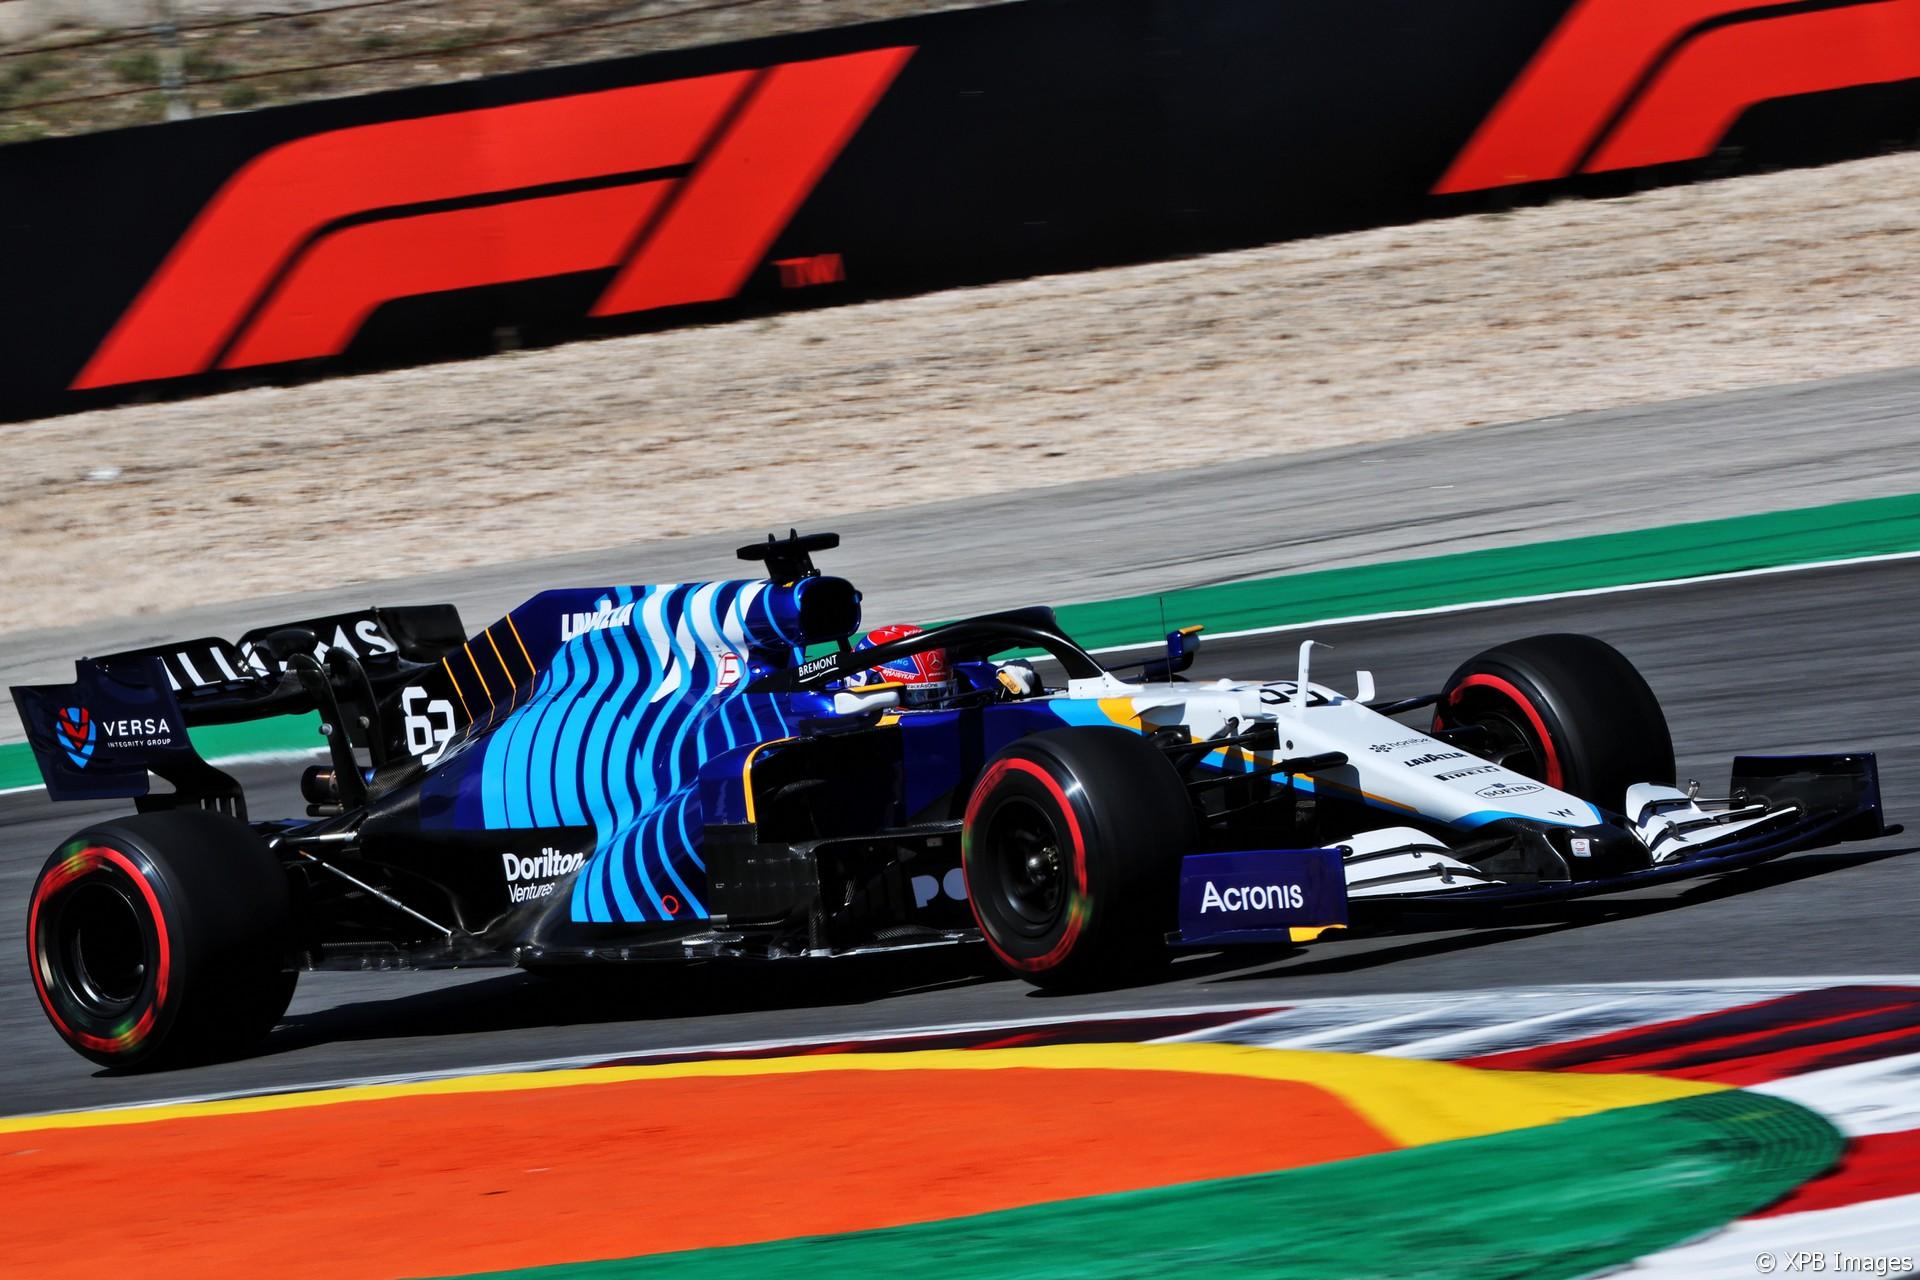 George Russell, Williams, Autodromo do Algarve, 2021